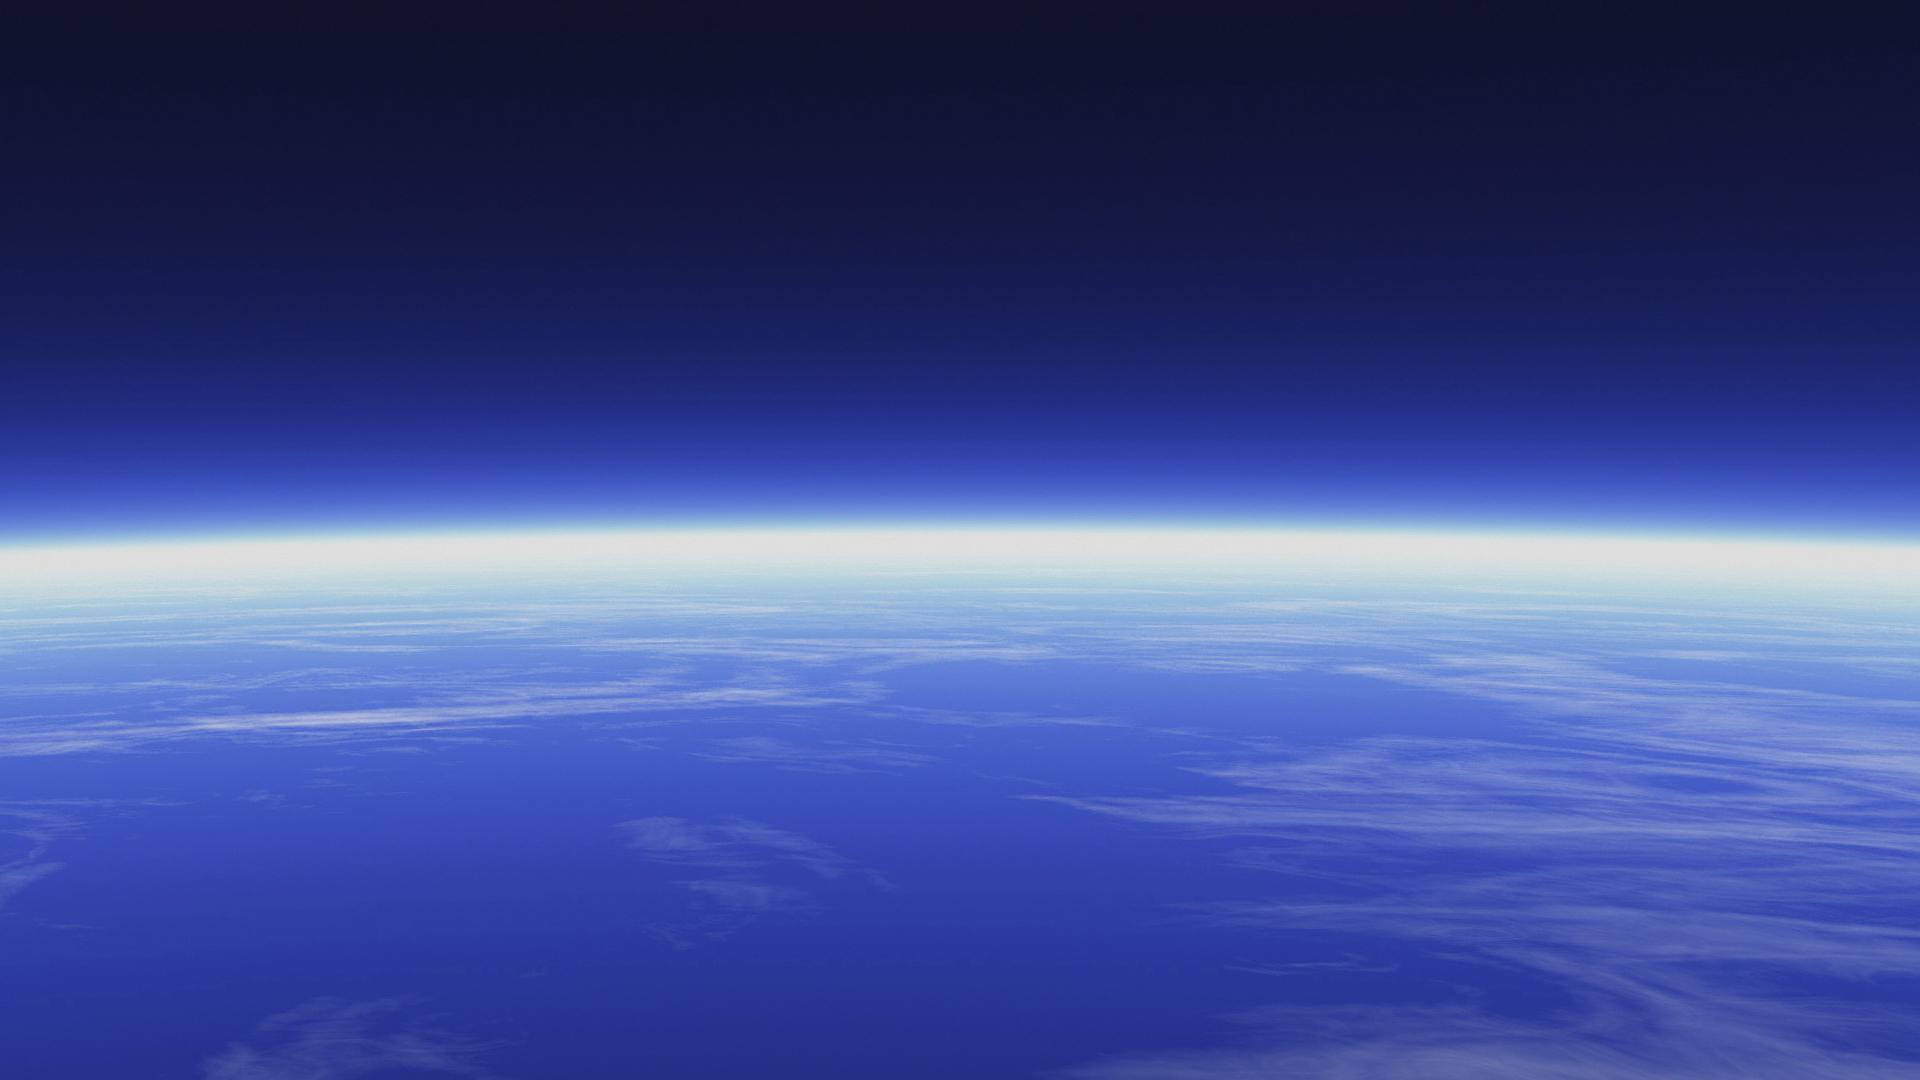 Finding Life Beyond Earth Hero